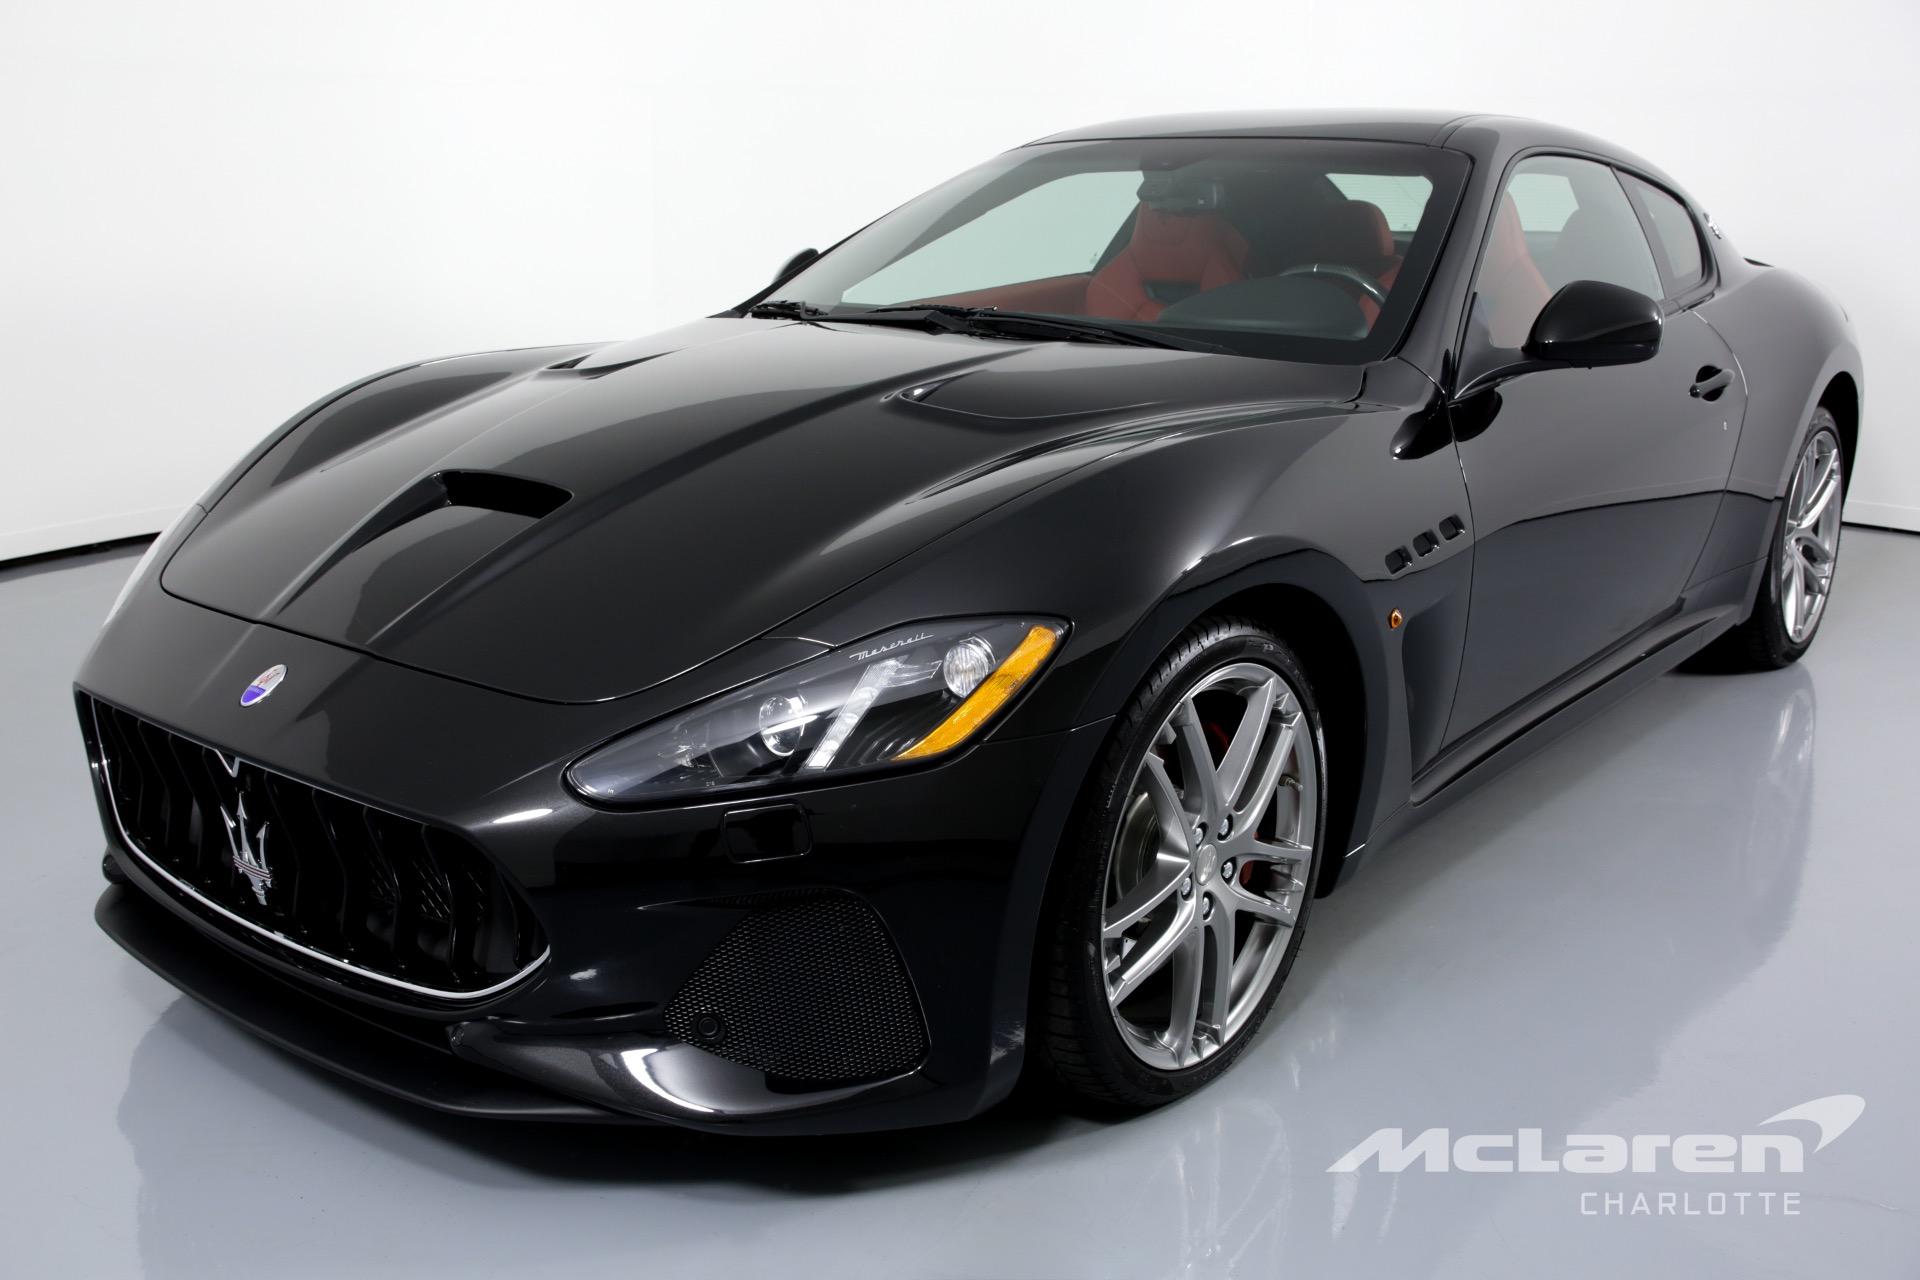 Used 2018 Maserati GranTurismo MC | Charlotte, NC